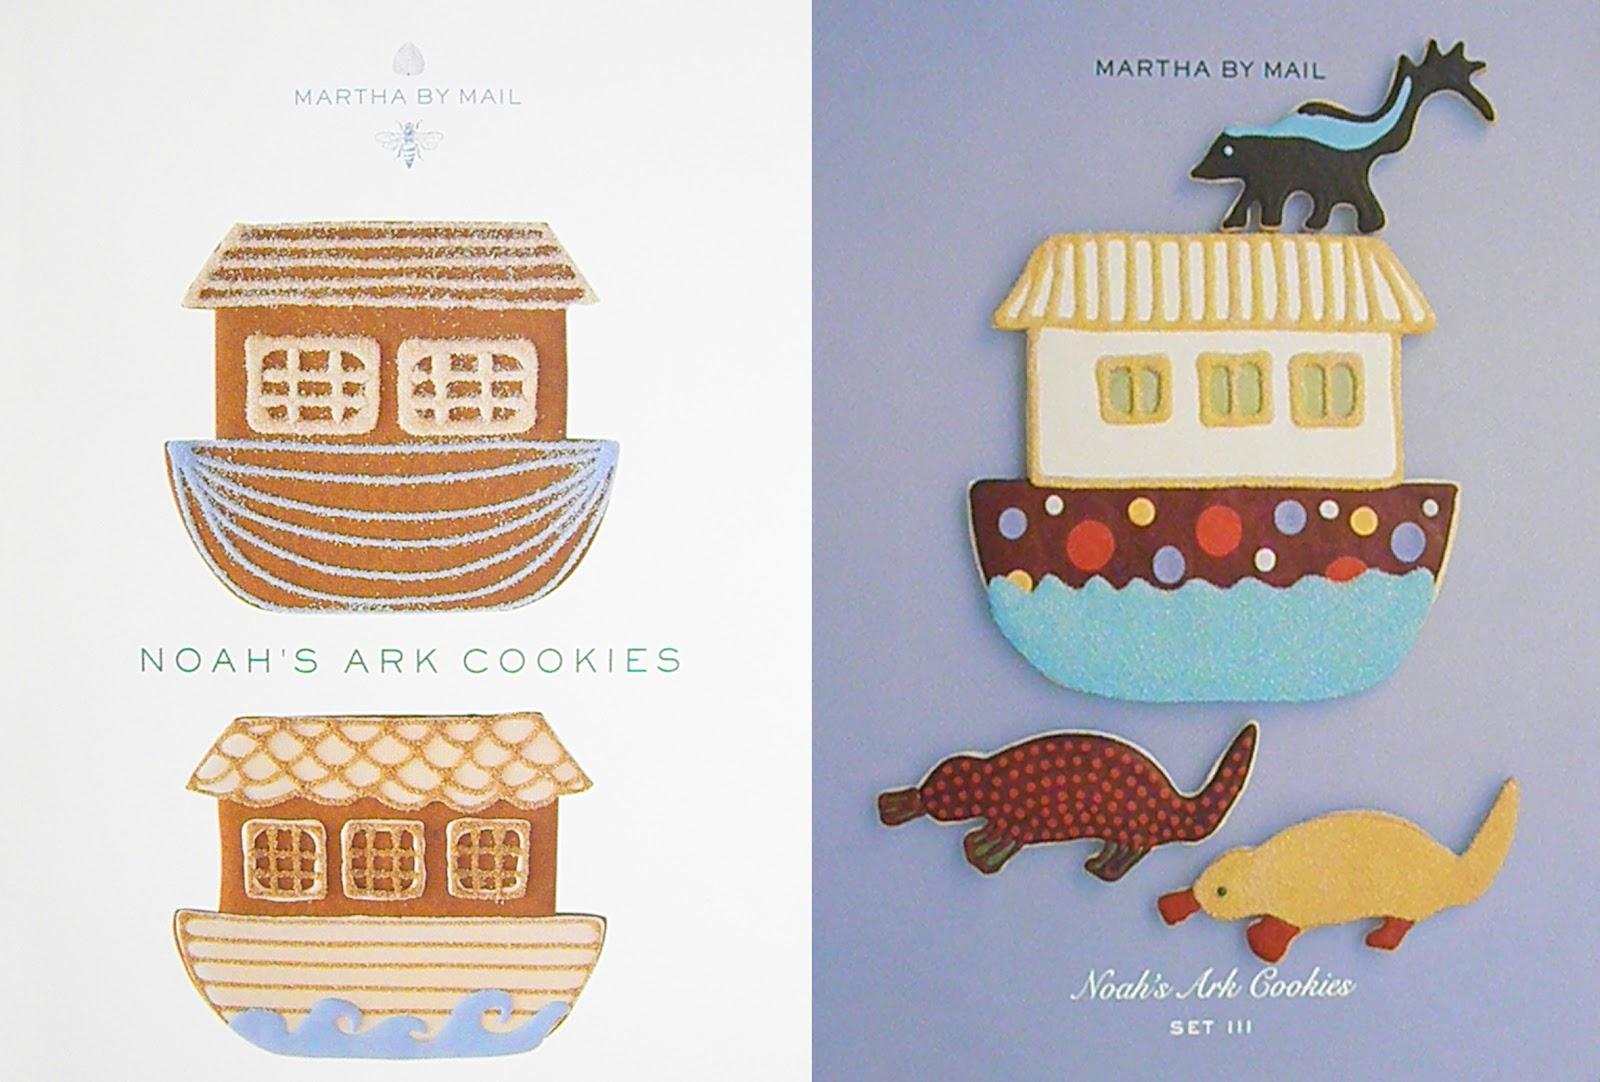 ed0579eca4b MARTHA MOMENTS: David's Martha By Mail Cookie Cutter Sets